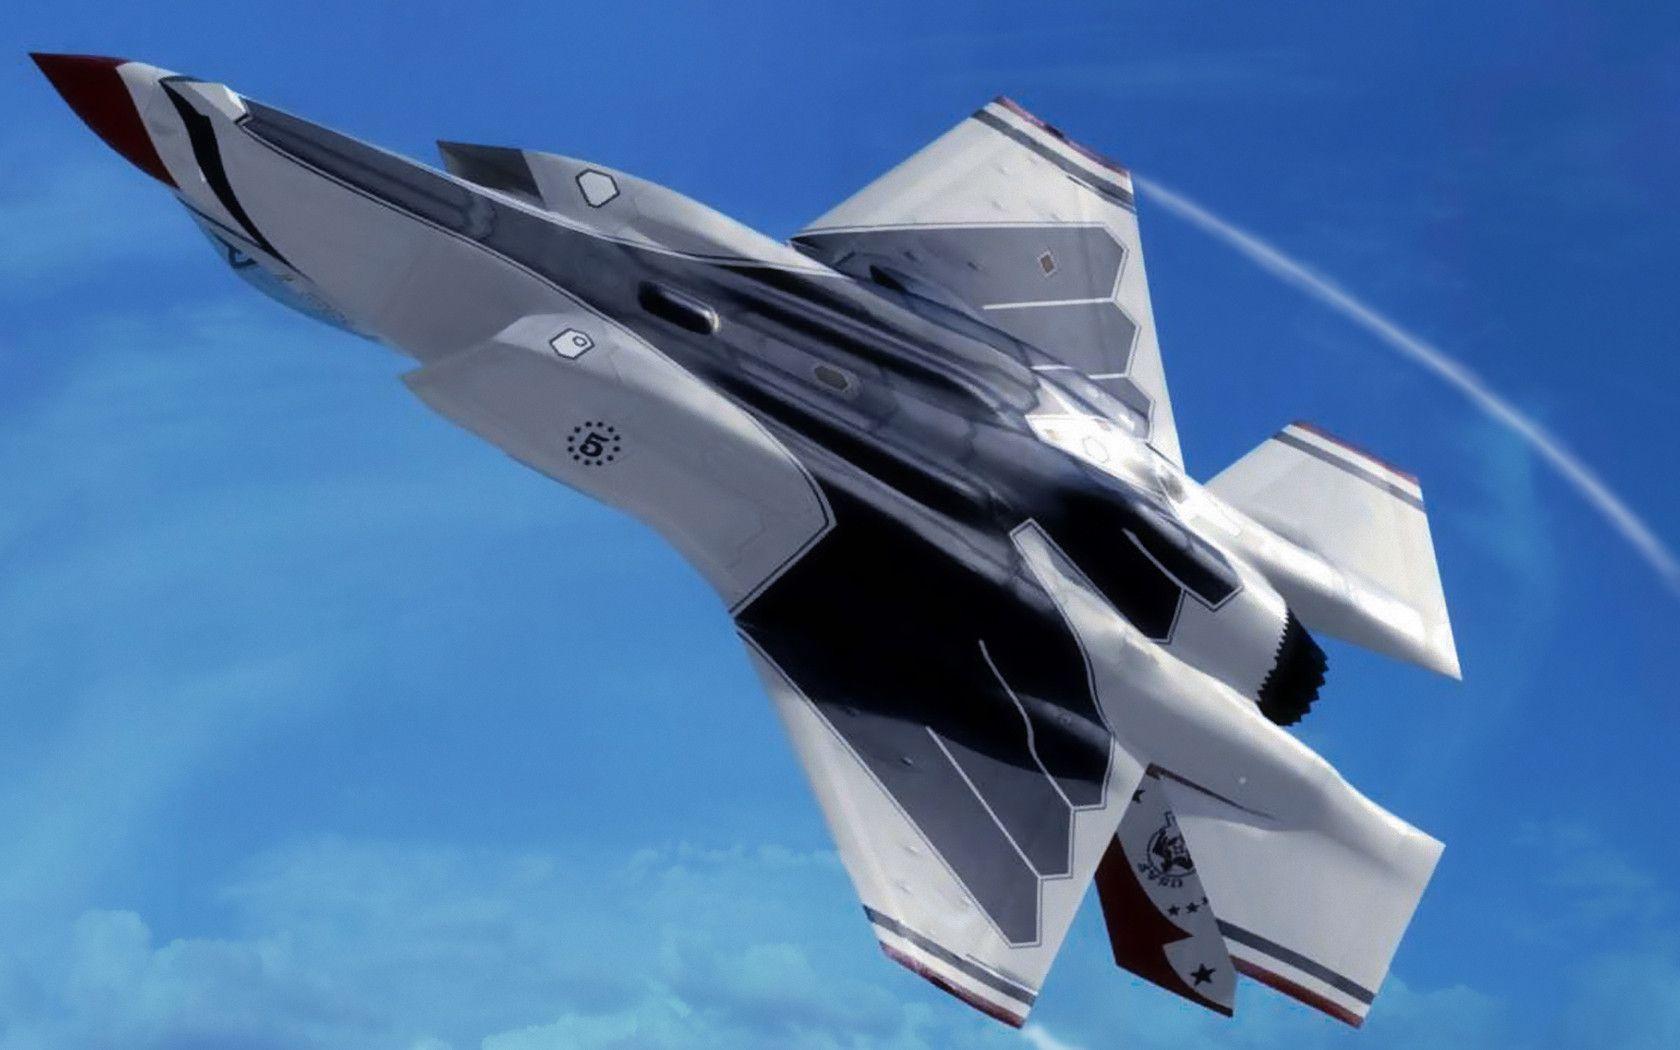 American Jet Fighter Wallpaper  richardseamancom